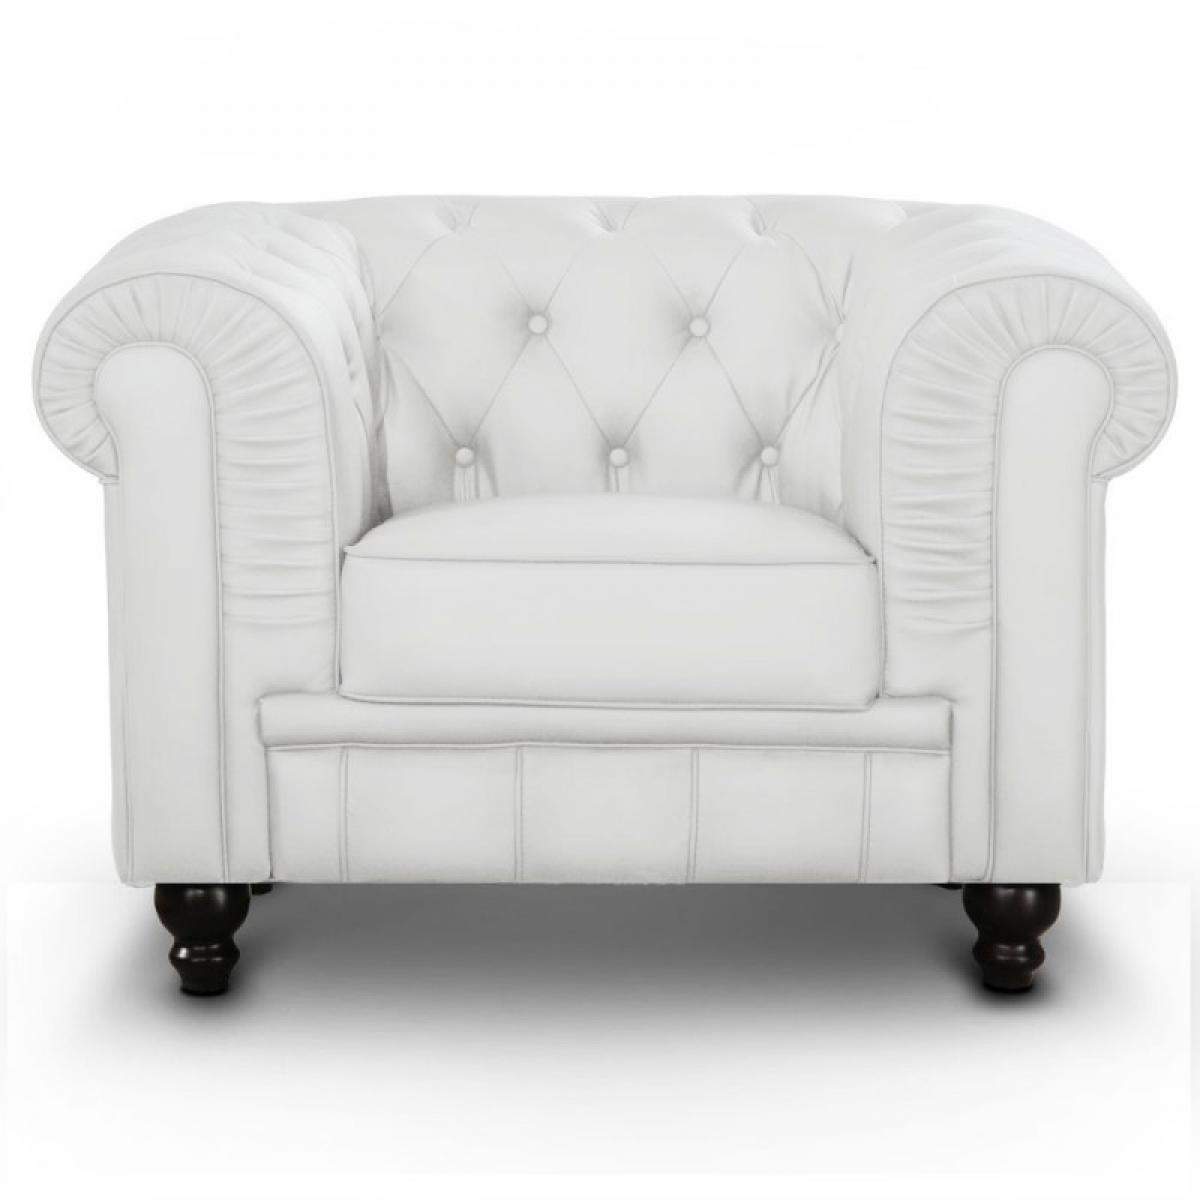 Meubler Design Fauteuil Chesterfield capitonné - PU Blanc